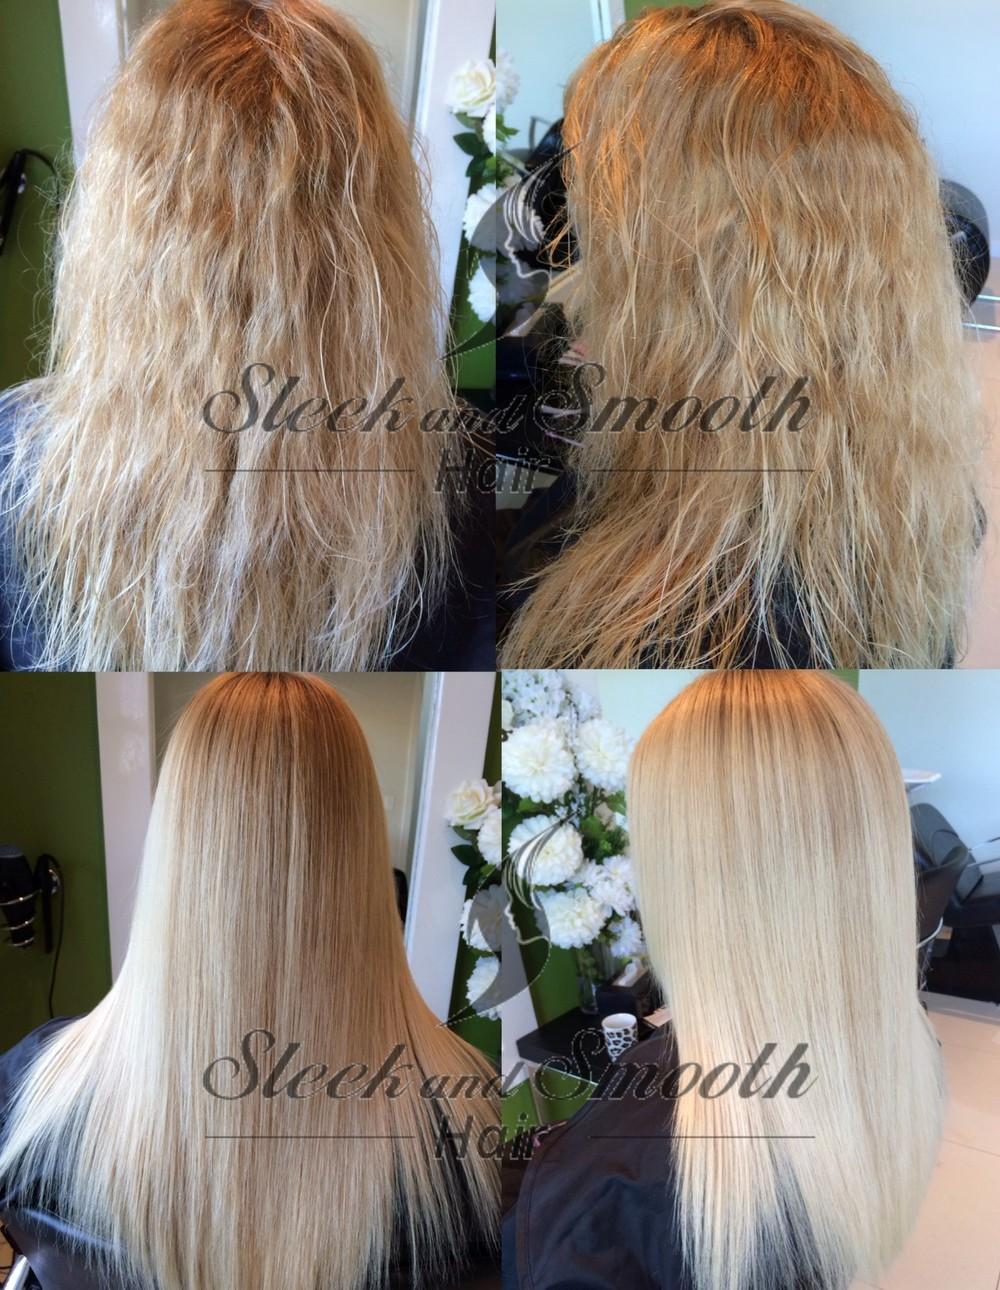 Customer Testimonials Sleek And Smooth Hair